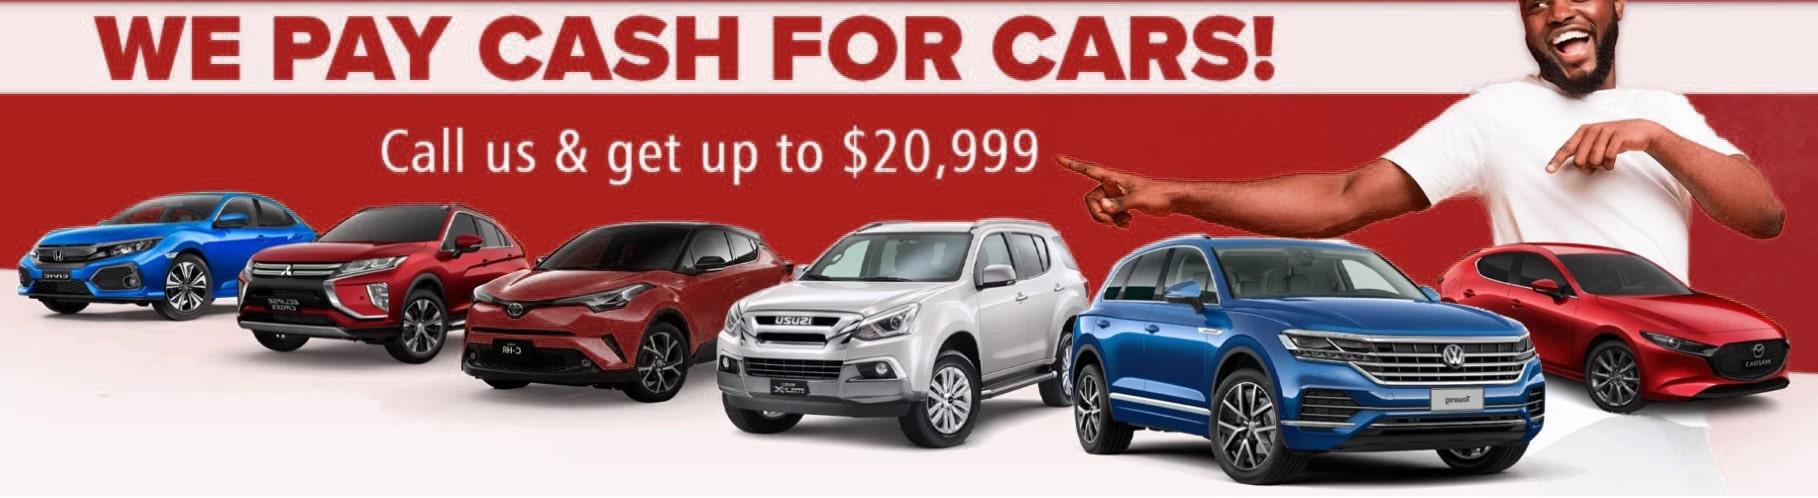 cash for cars melbourne vic